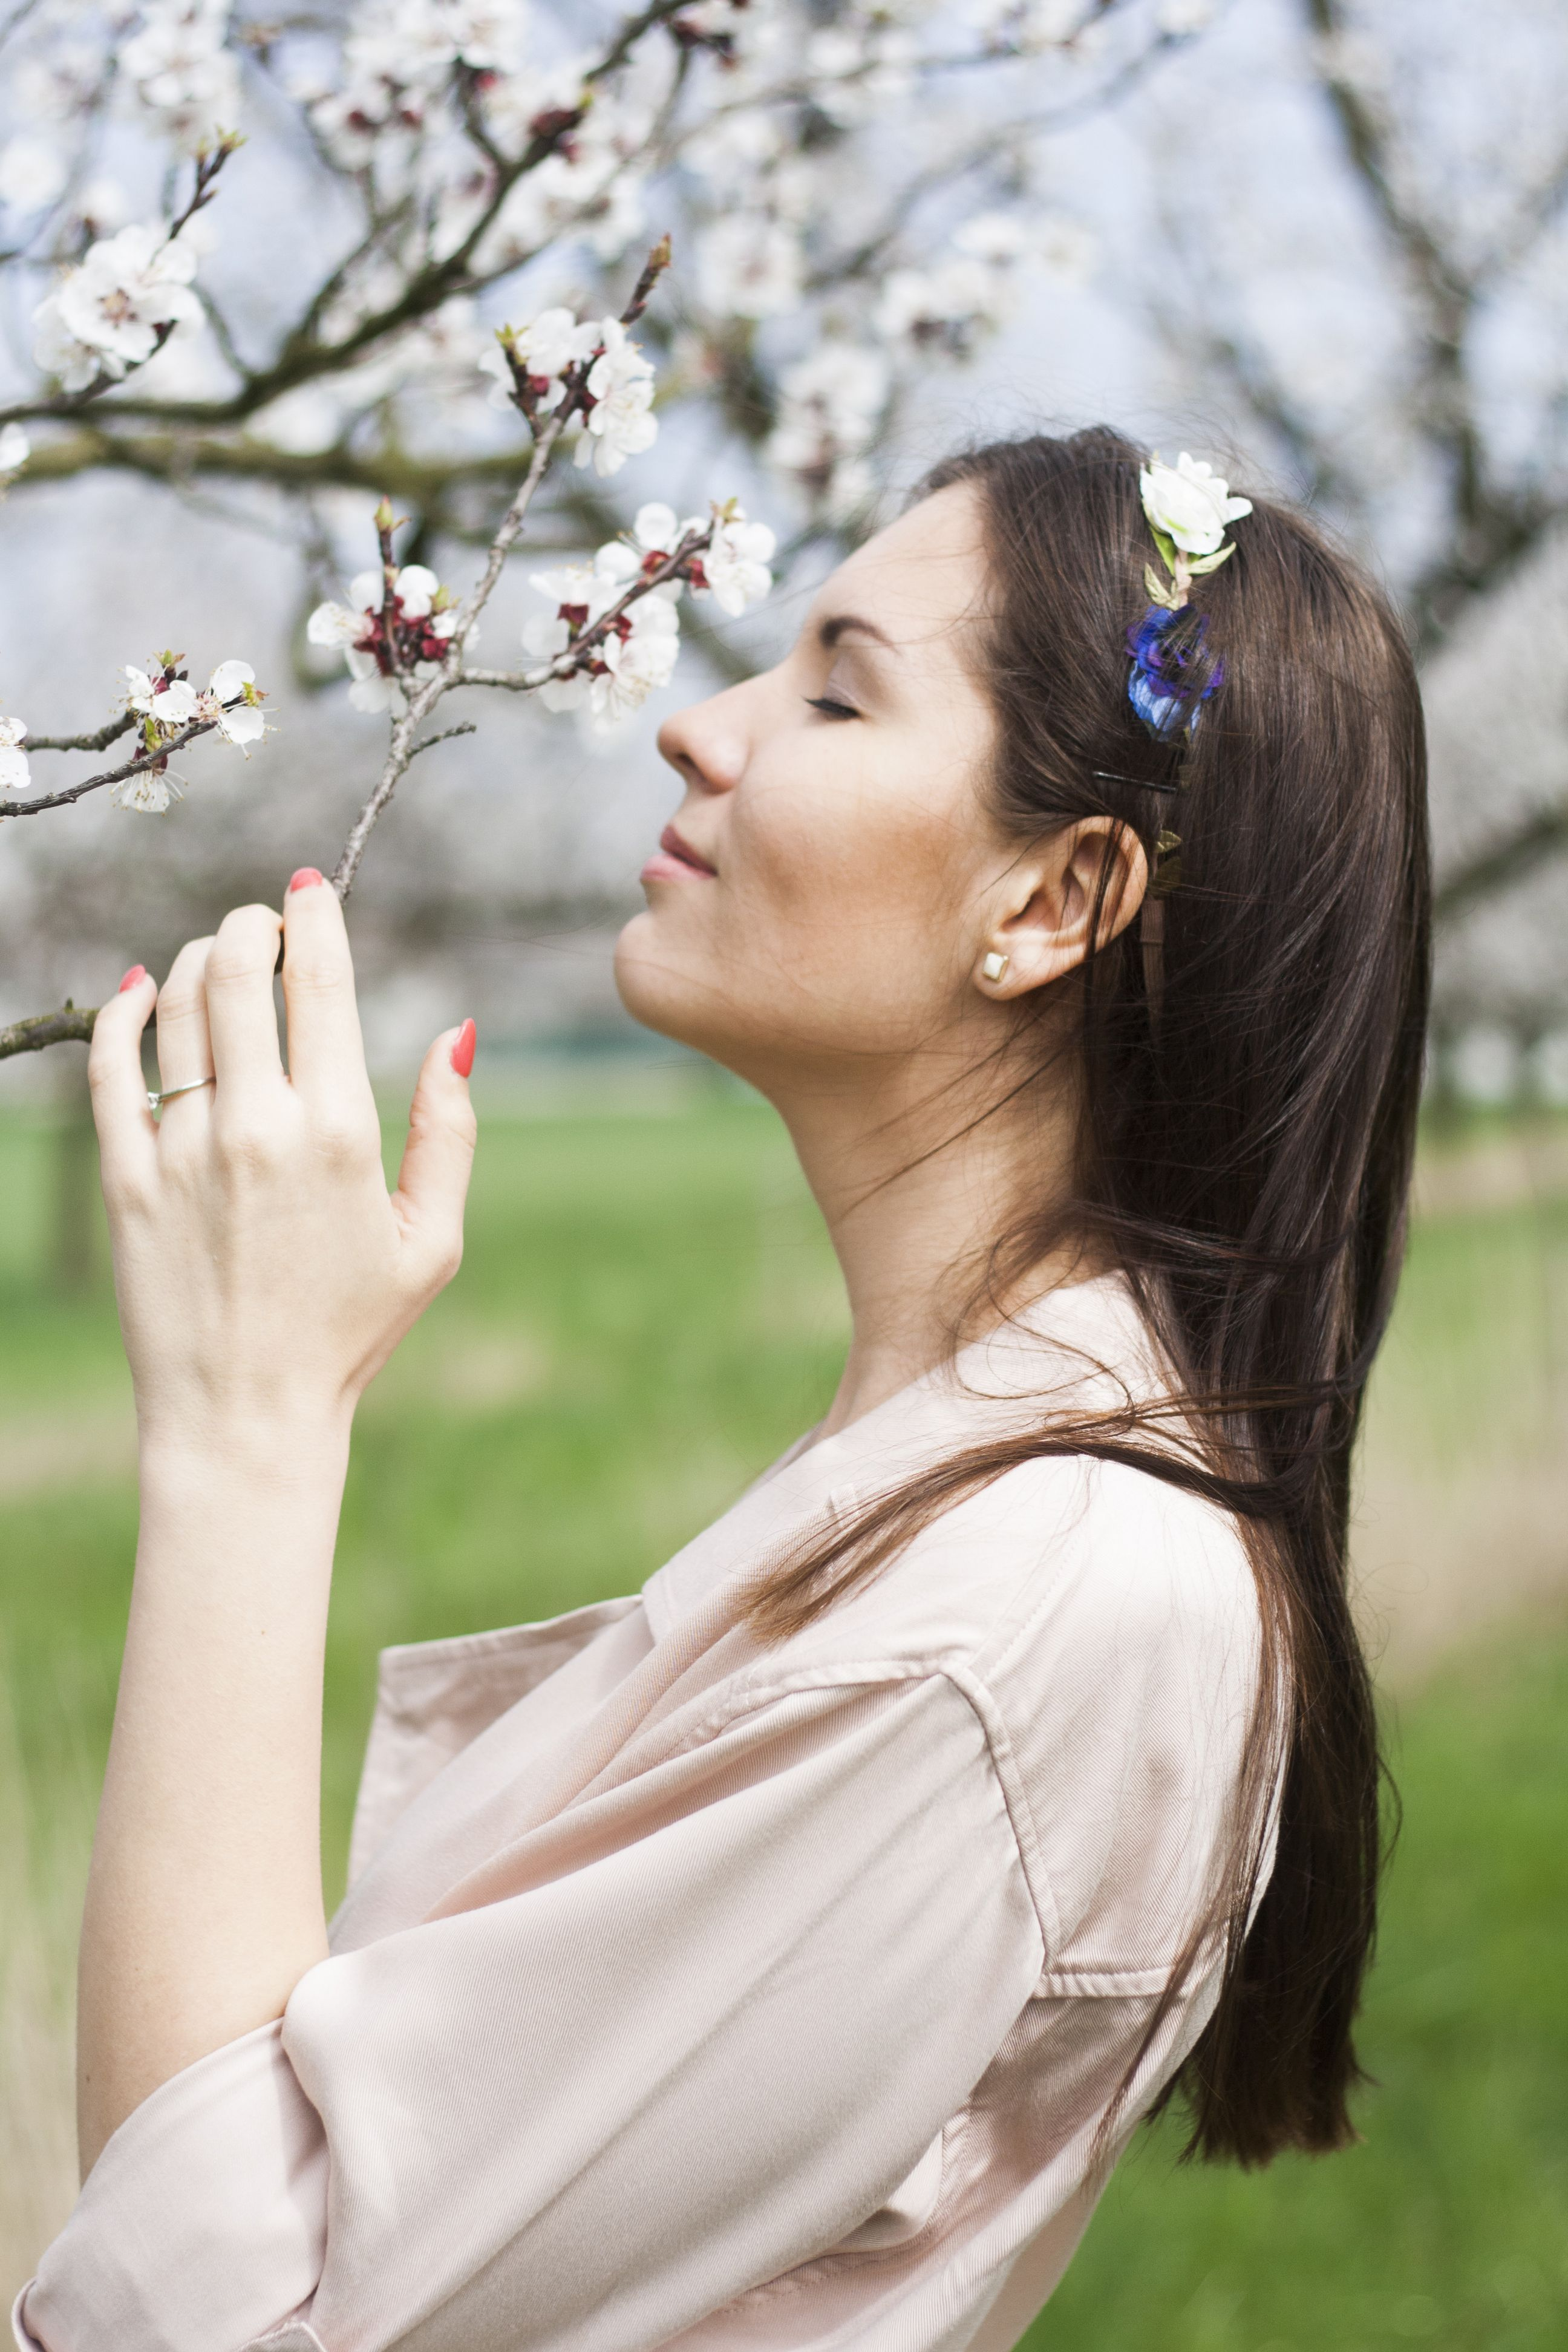 #fashionblogger #slovakblogger #flower #pinkmood #cute #slovakgirl #spring #springmood #headbands